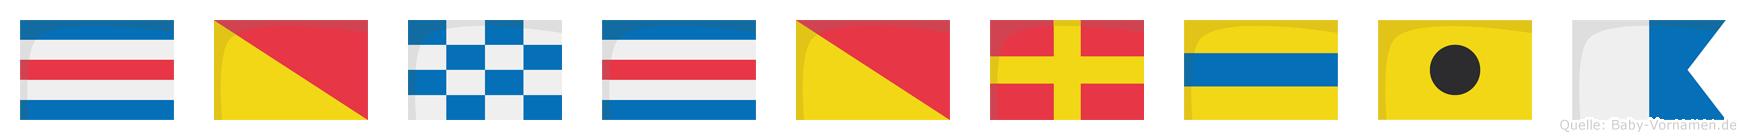 Concordia im Flaggenalphabet